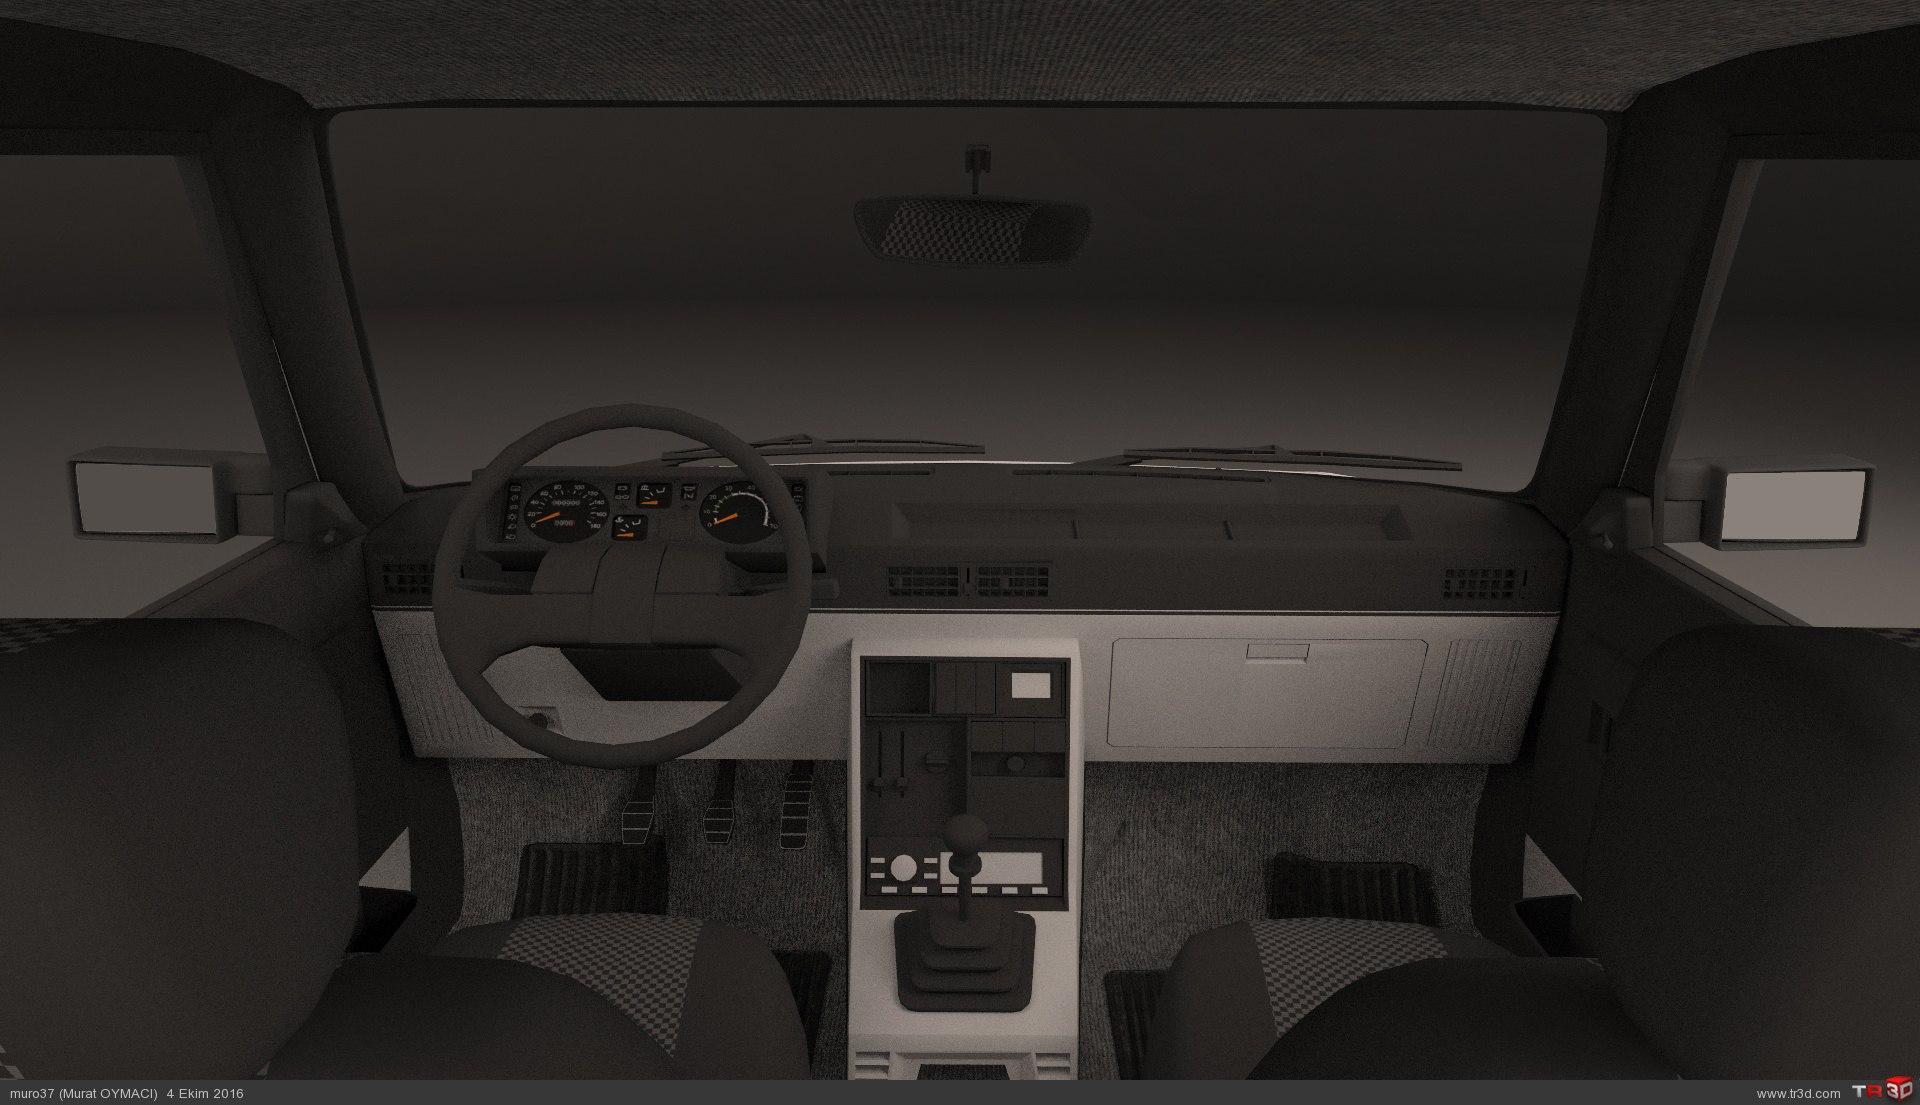 1992 Renault 9 Broadway 4